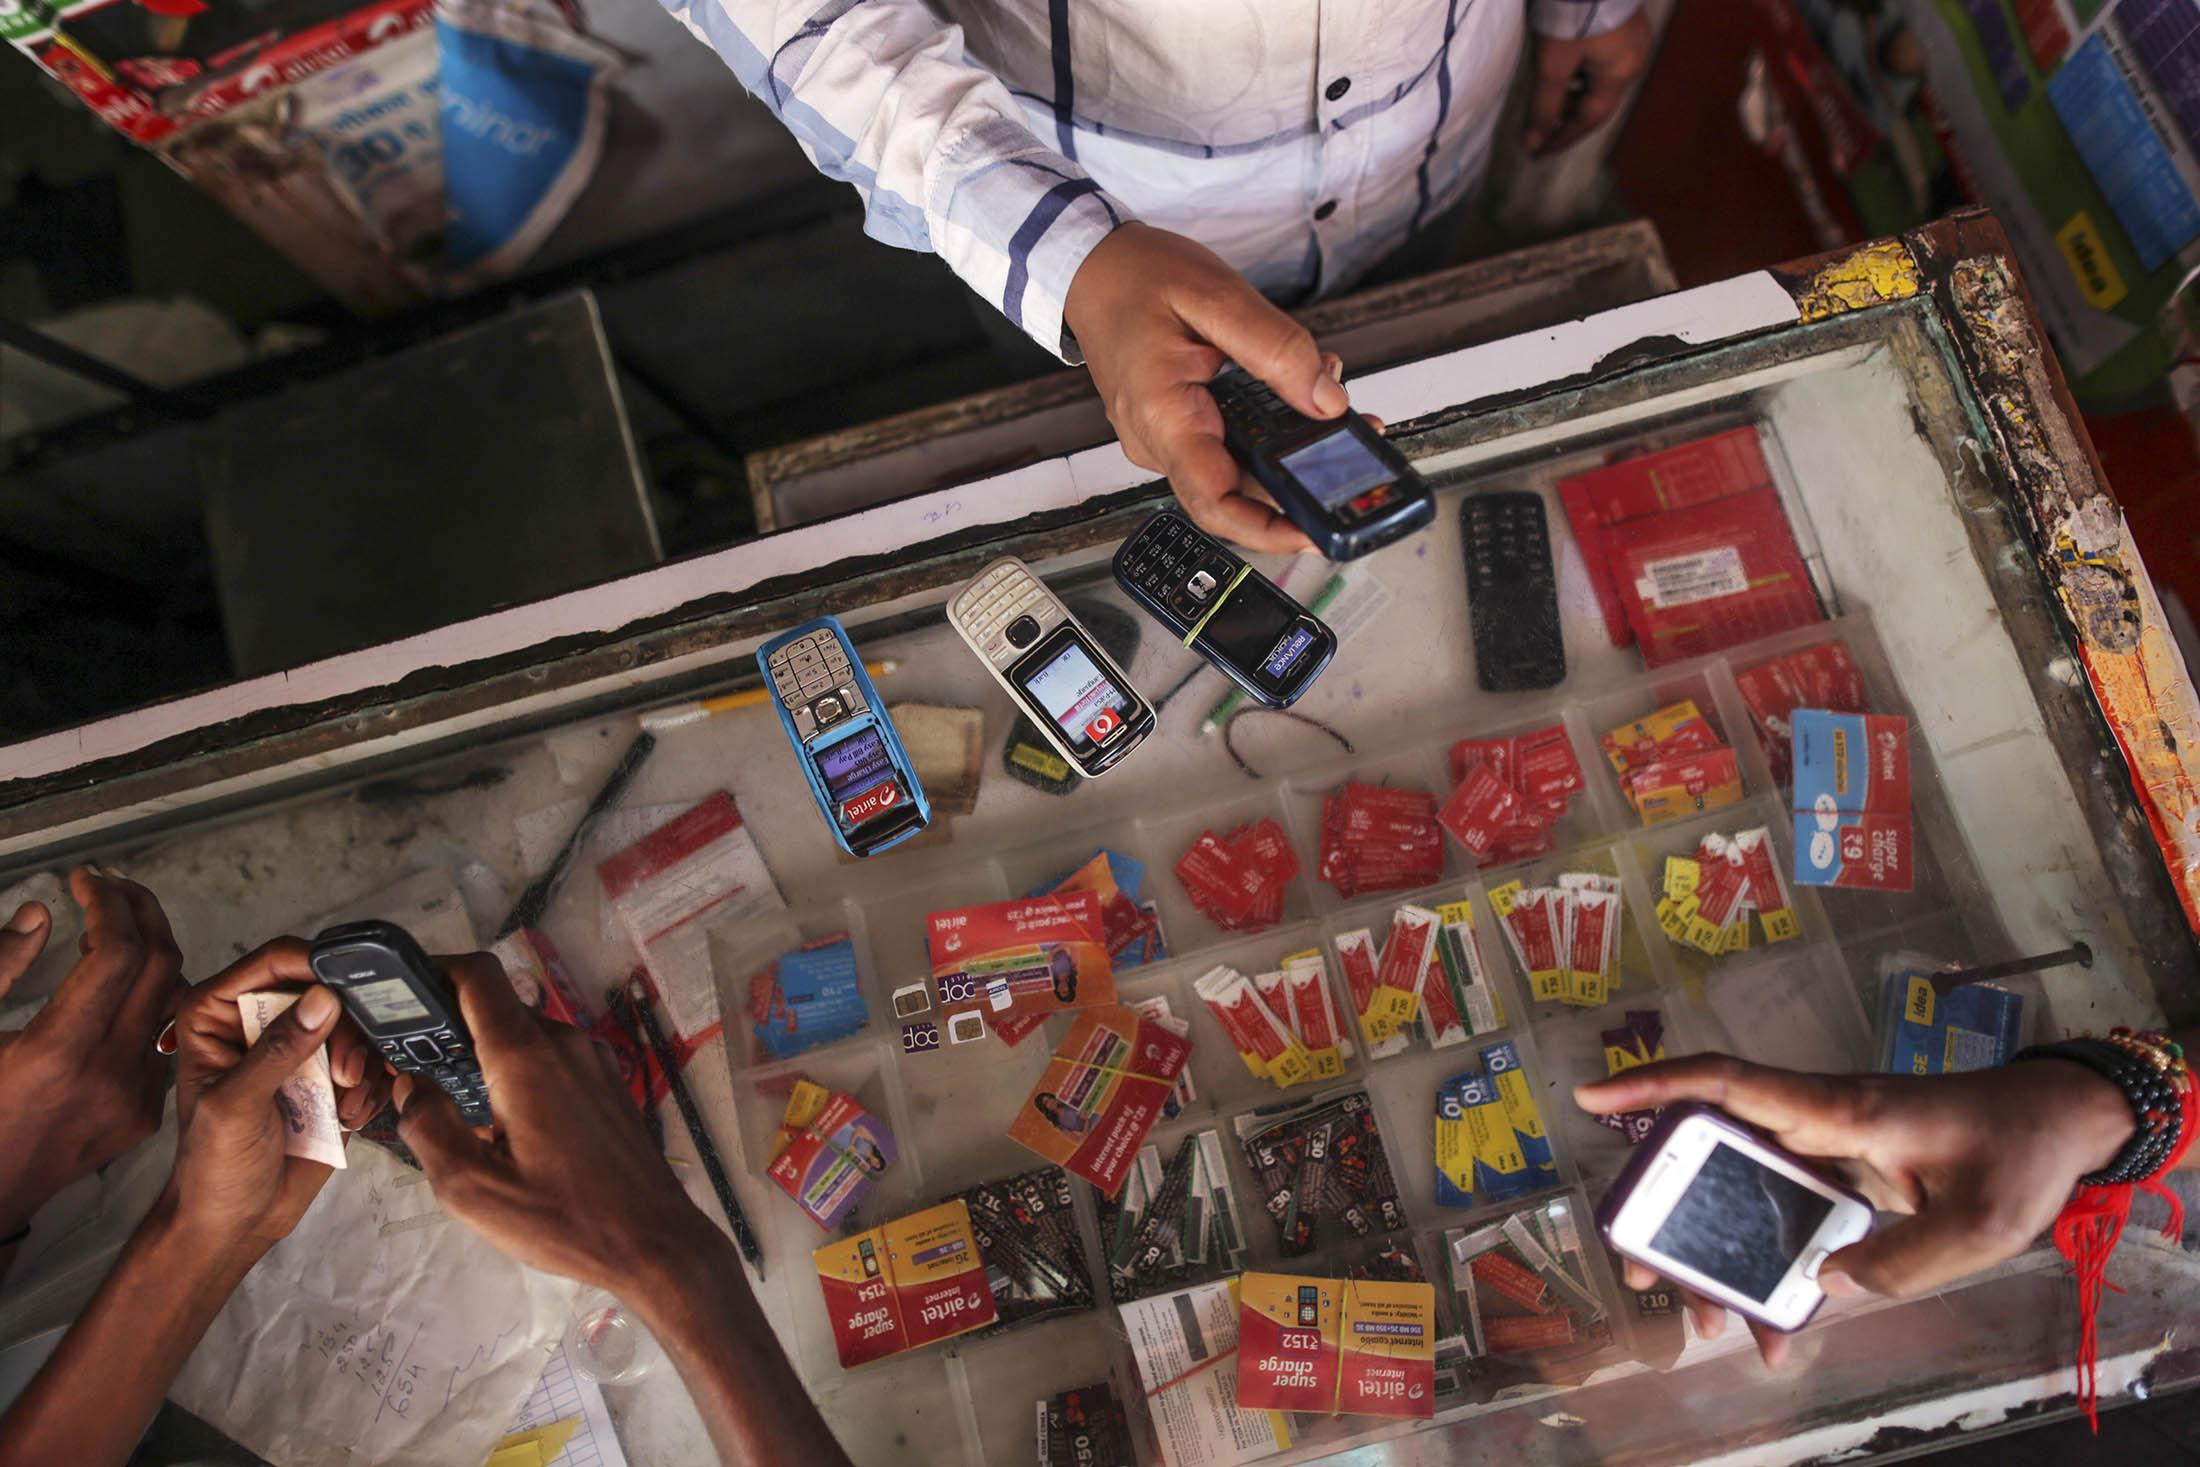 The $79 Billion Airwaves Dilemma  Vexing India's Telecom Barons - Bloomberg